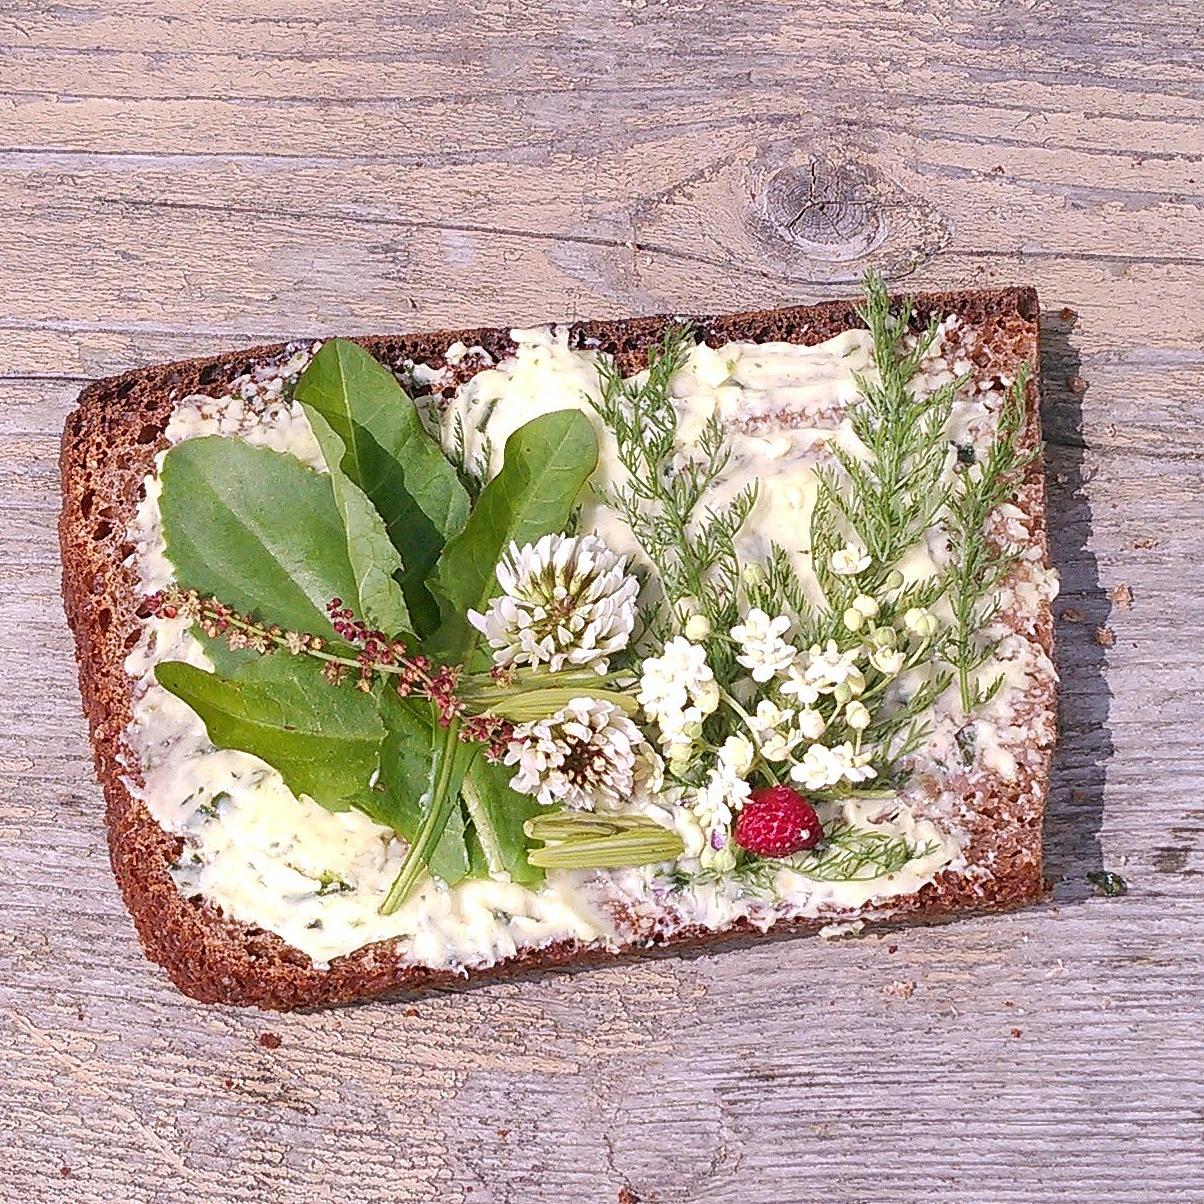 Fastfood fra naturen